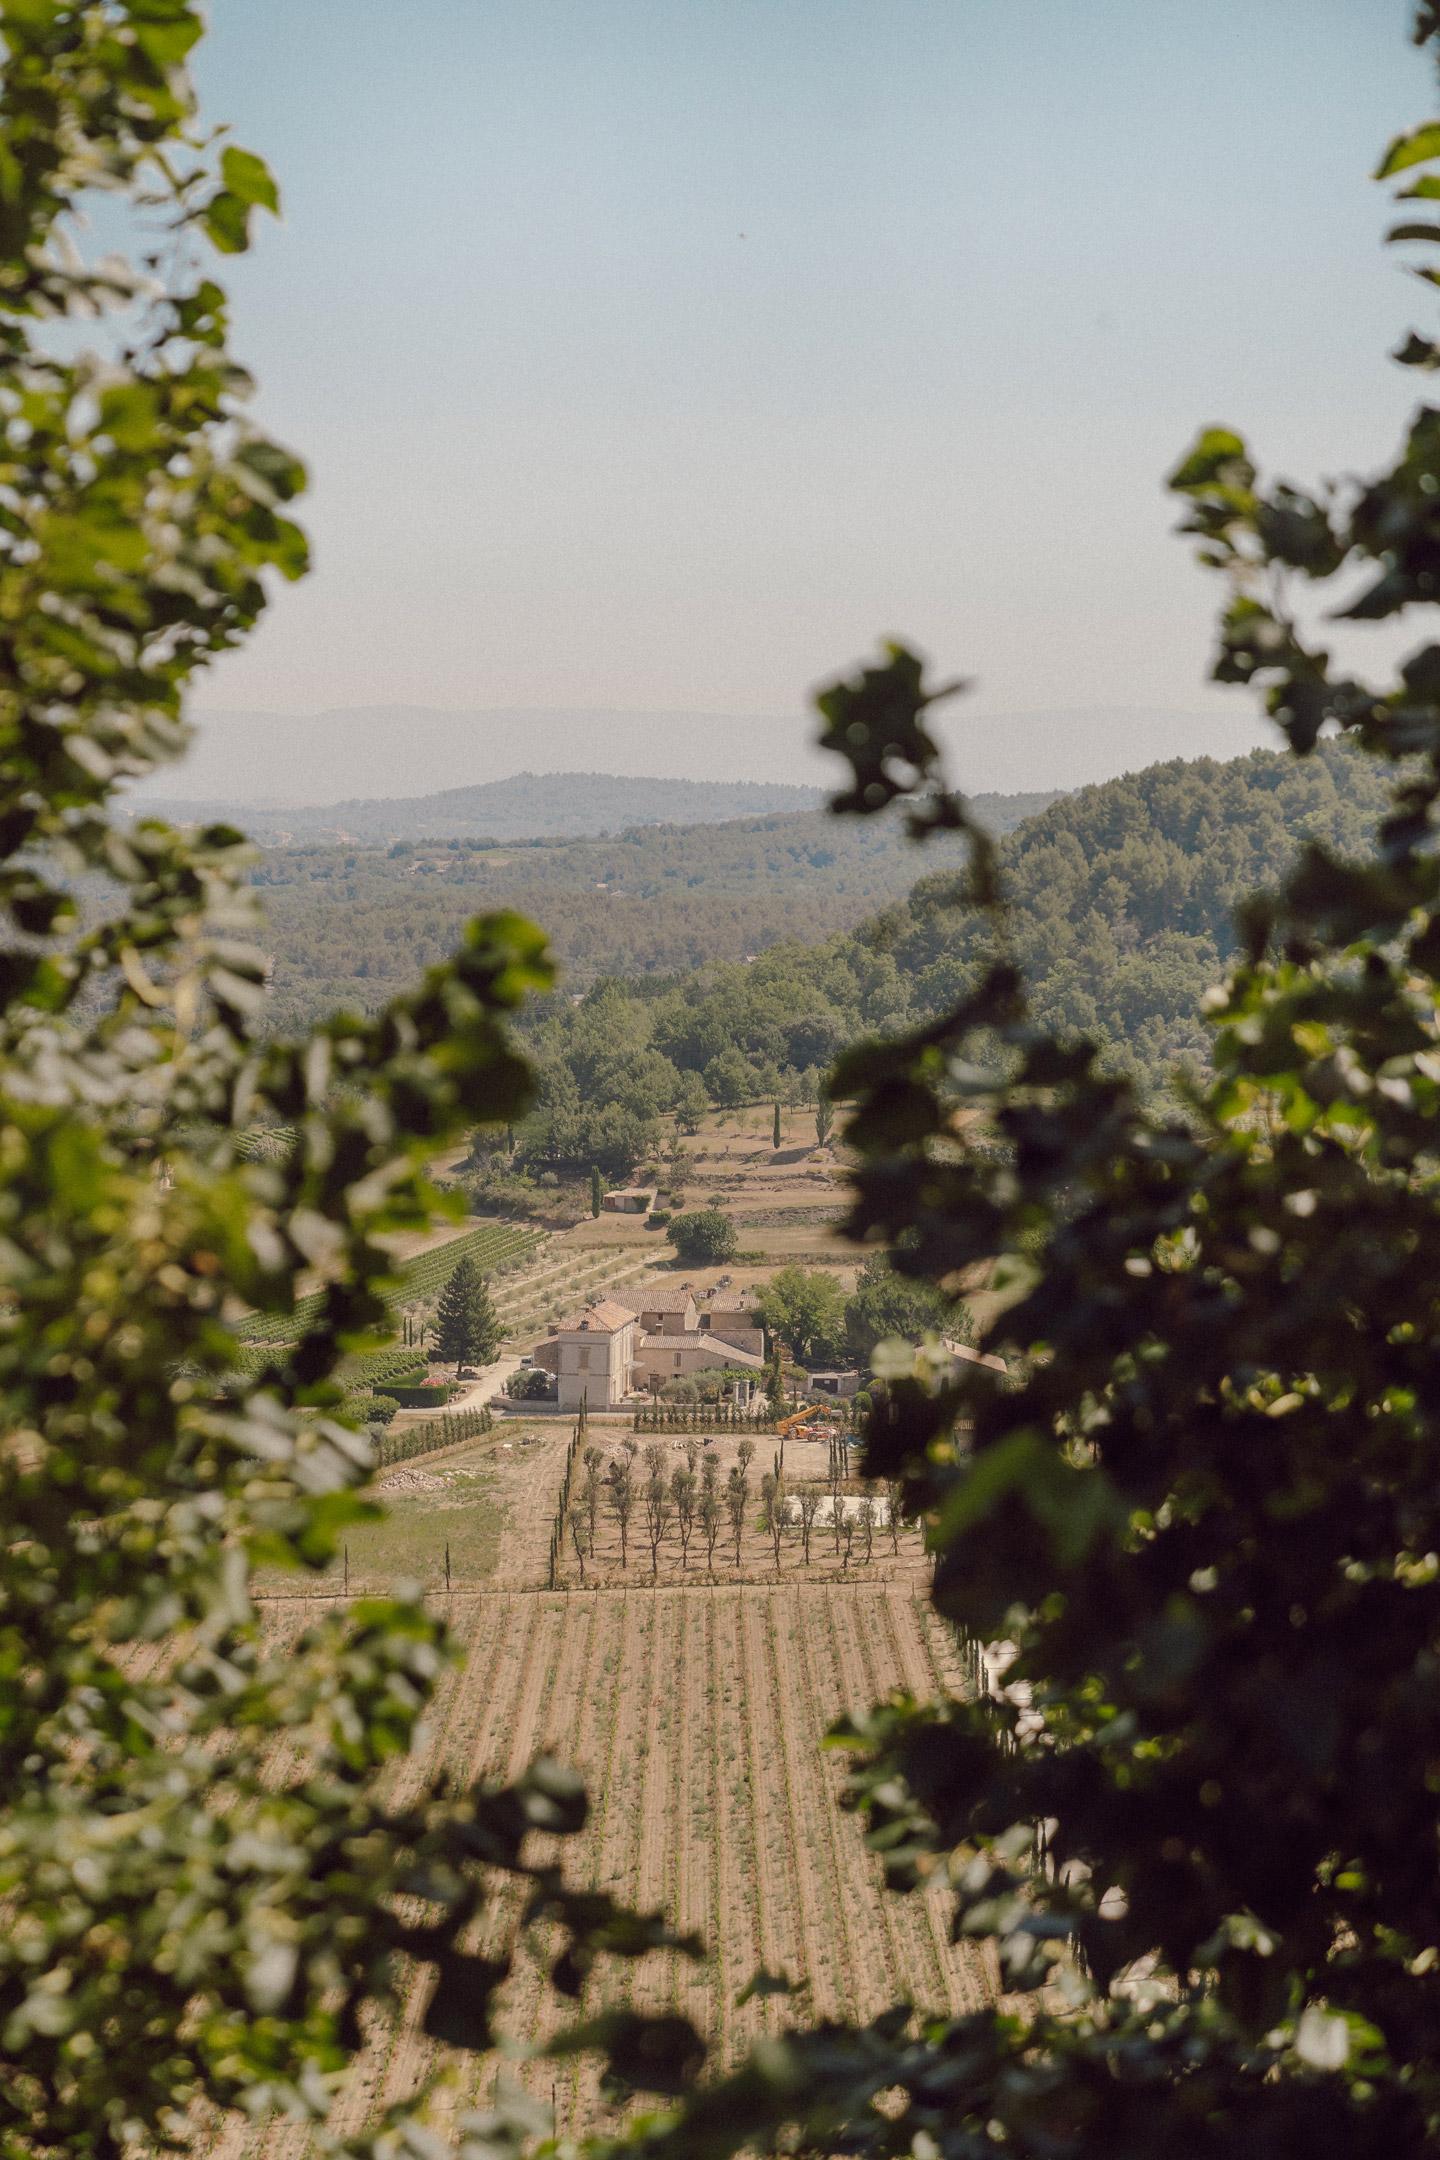 provence-menerbes-oppede-isle-sur-la-sorgue-16